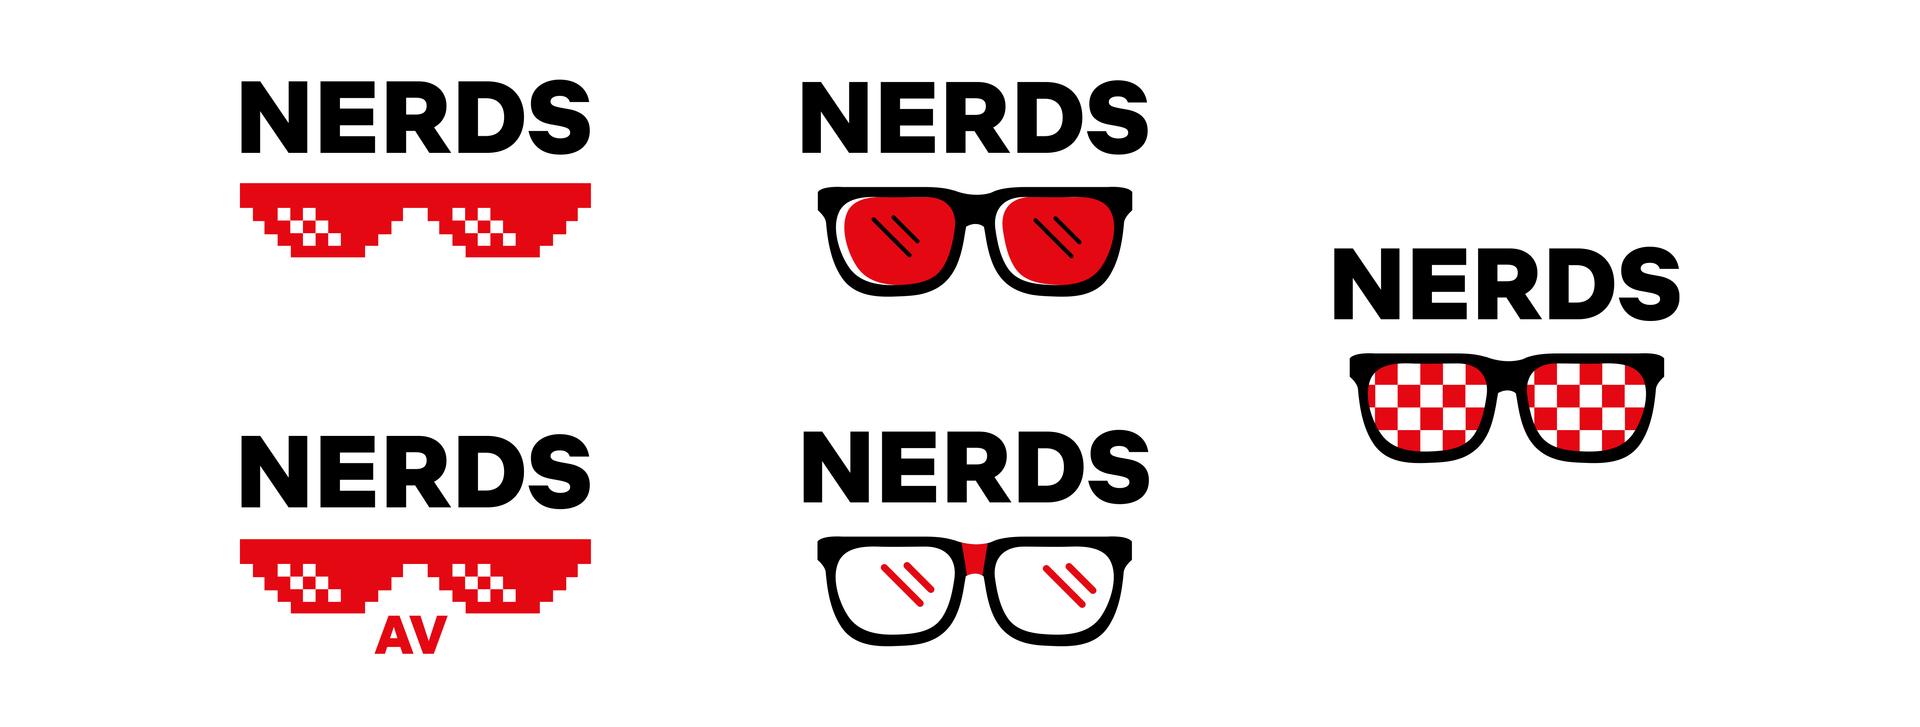 nerd glasses concept